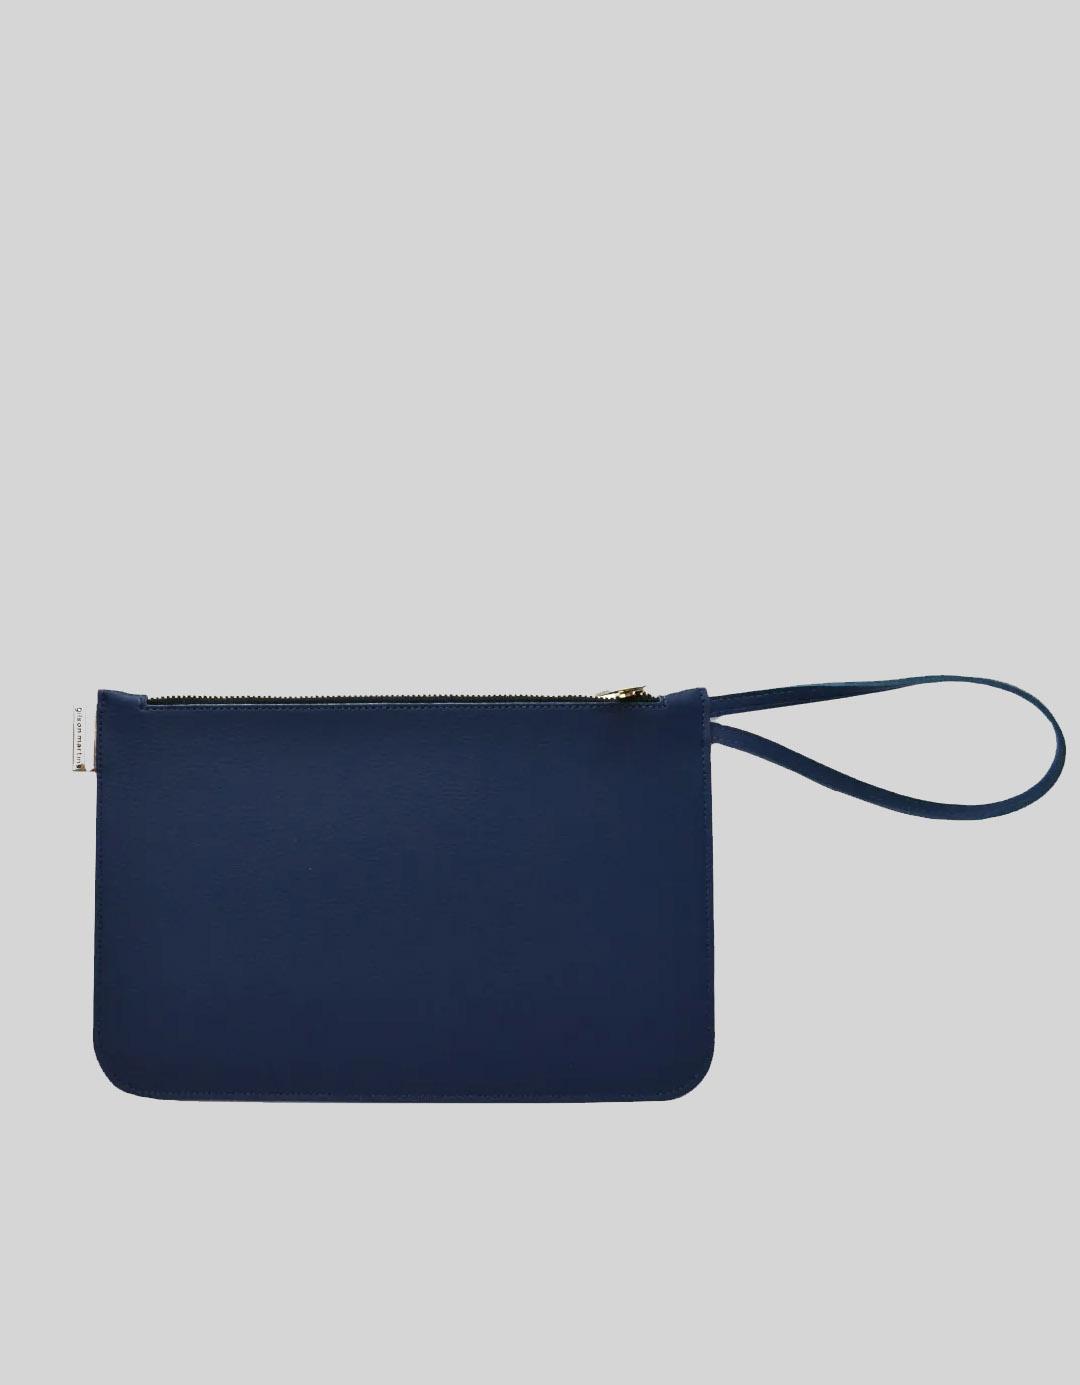 Clutch Customizada Azul Marinho Soft Gilson Martins